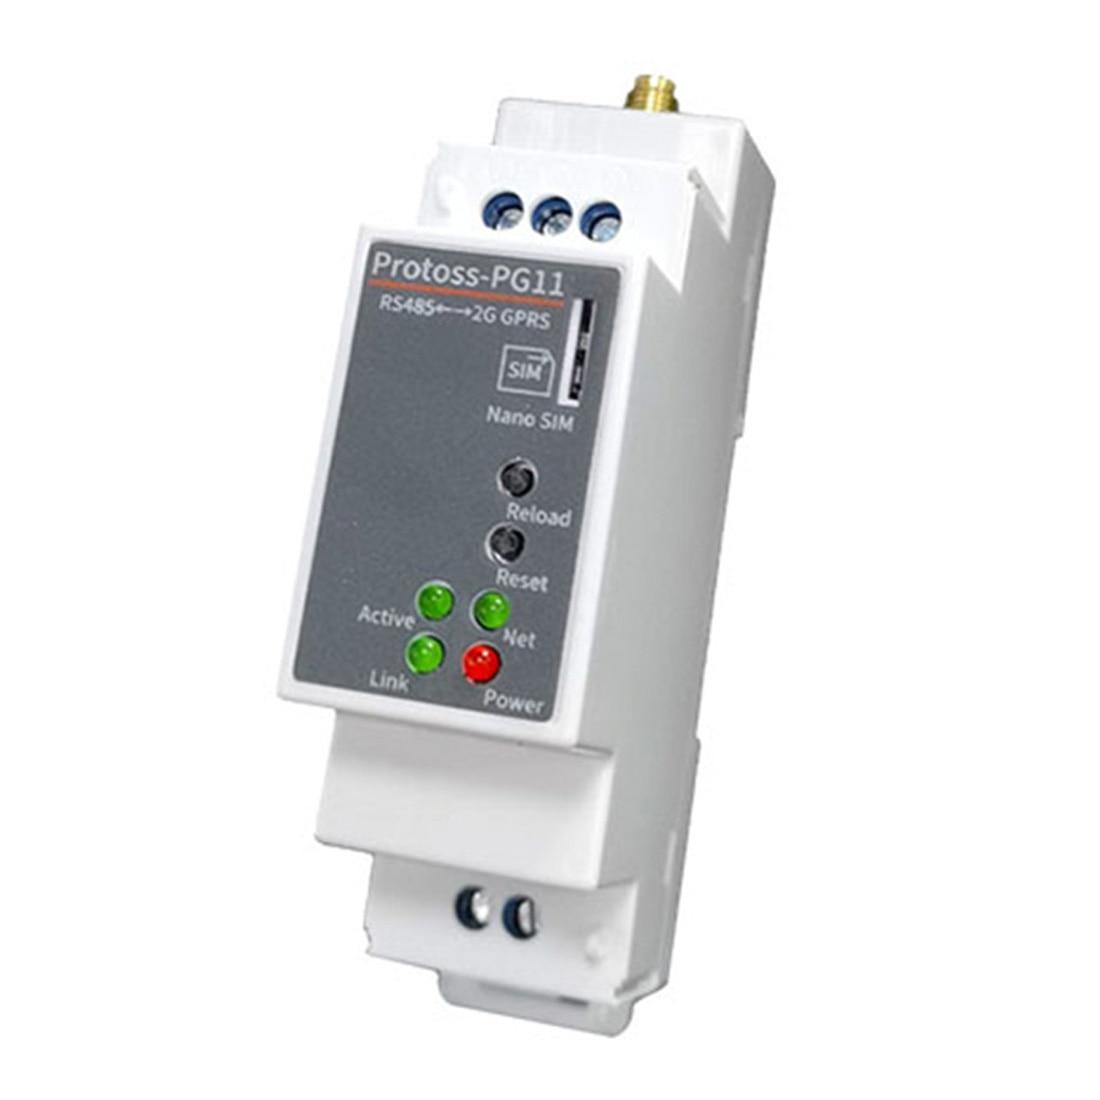 Protoss-PG11 RS485 إلى GPRS DTU 220 فولت خادم تسلسلي لاسلكي مع السكك الحديدية تصاعد دعم GSM/GPRS و CMCC أو CUCC سيم بطاقة